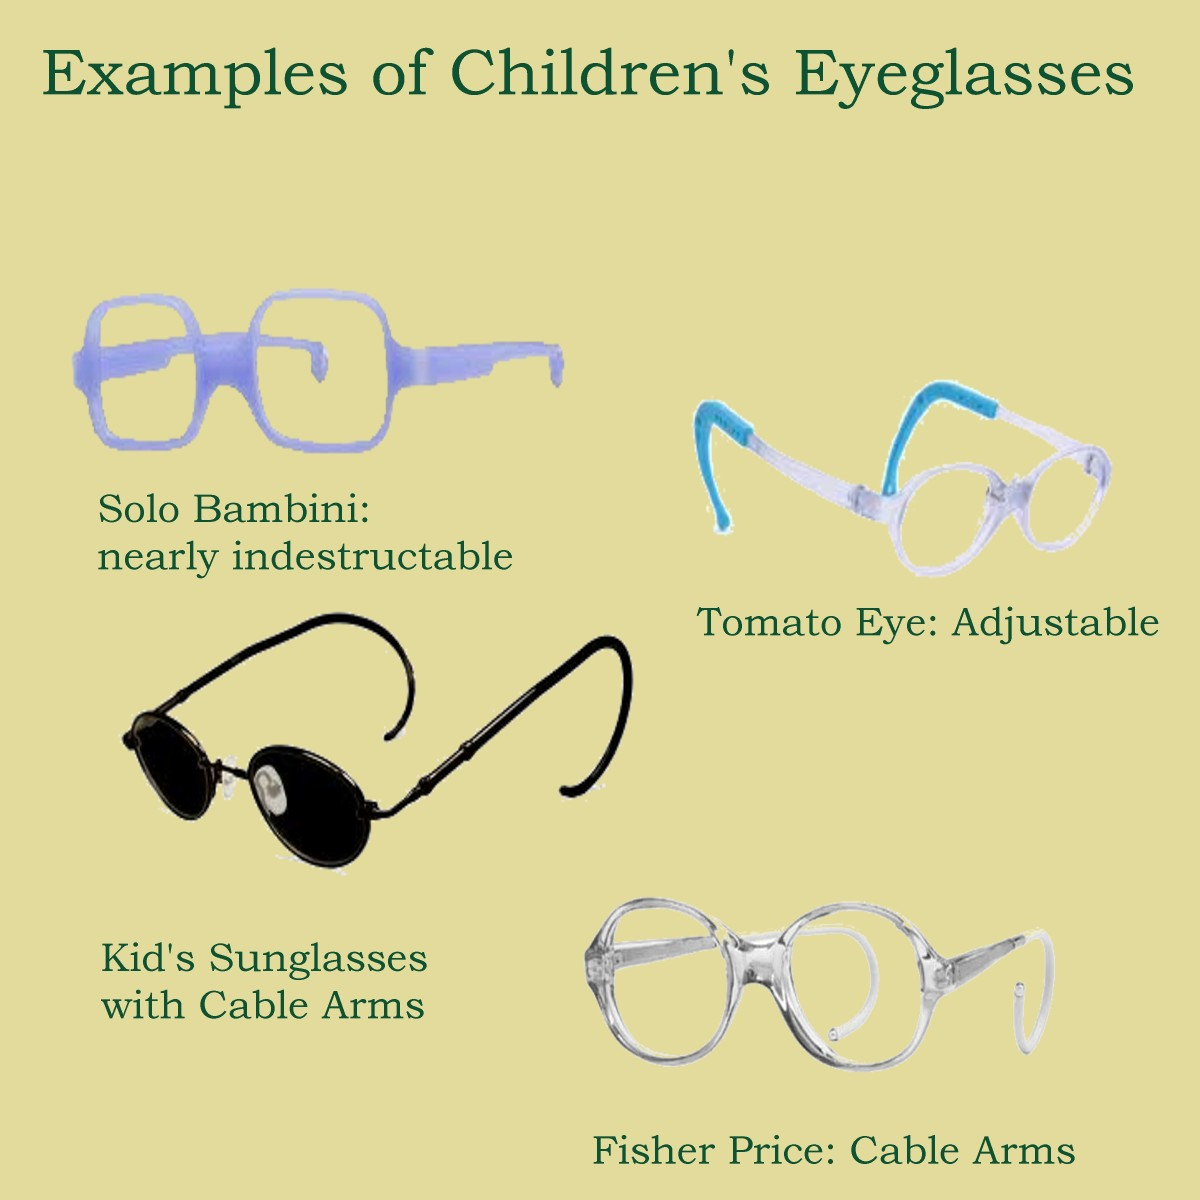 A few examples of kid's eyeglasses.